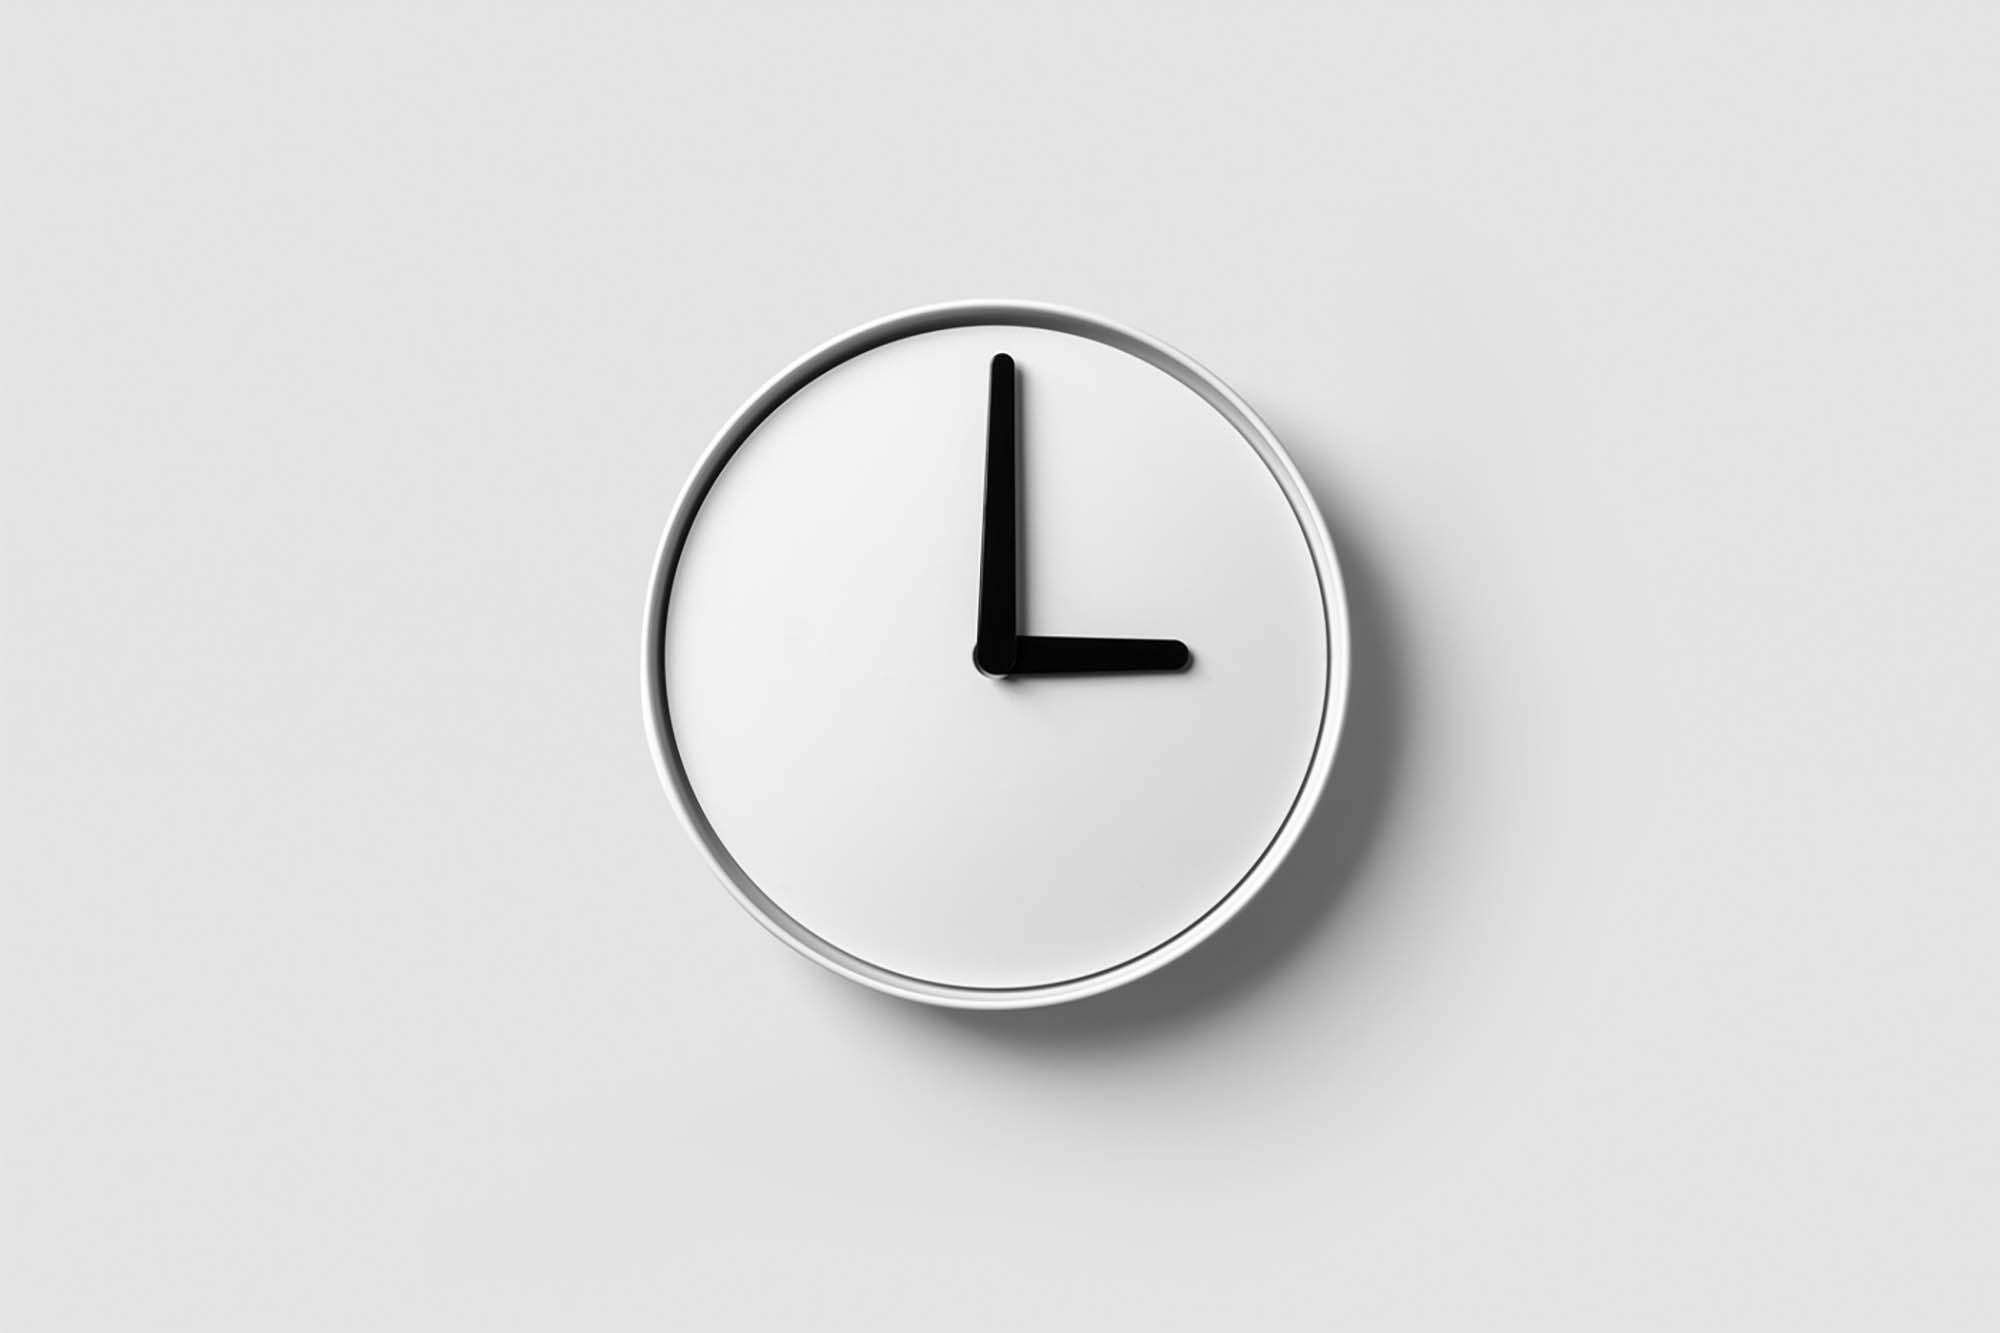 Clock Mockup 2